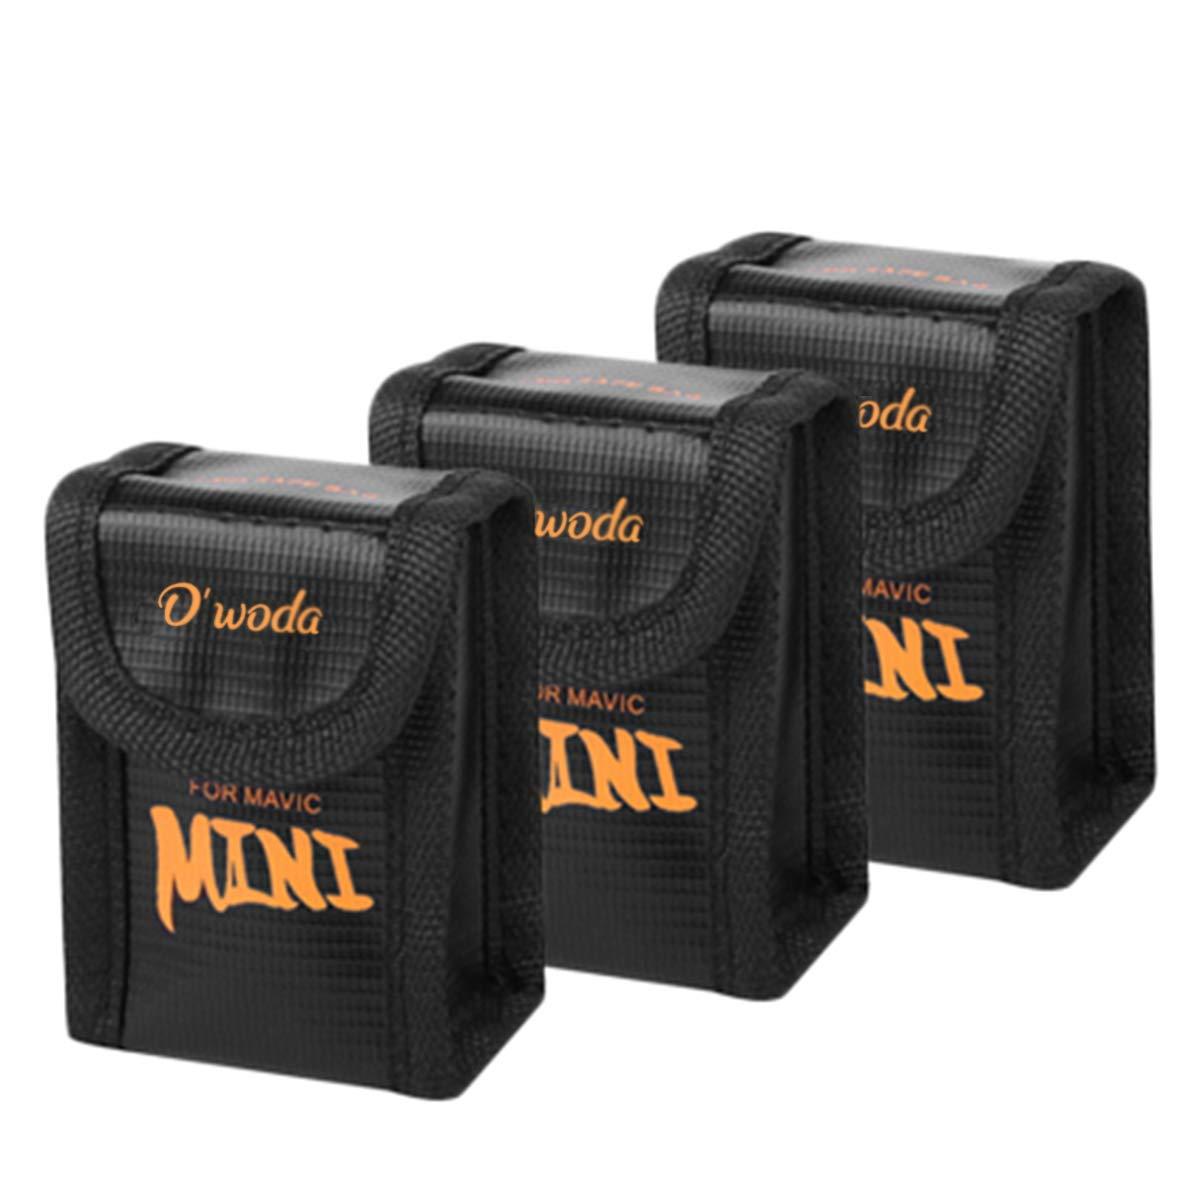 O'woda Lipo Battery Safe Bag Fireproof Explosion-Proof Batteries Charge Protector Bag for DJI Mavic Mini (Pack of 3)